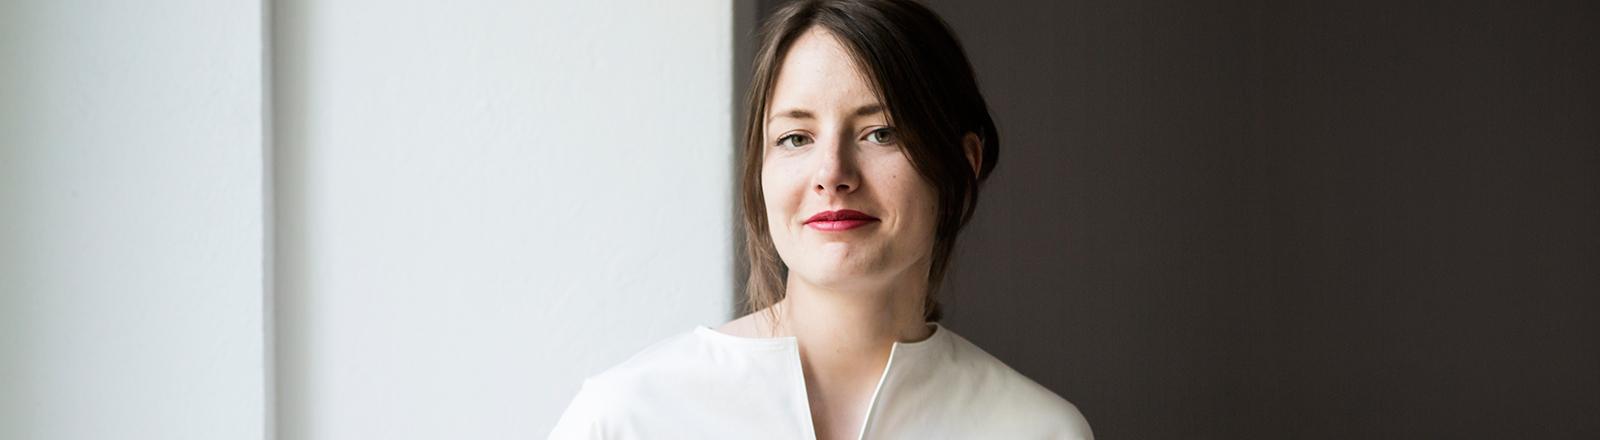 Janina Mütze Gründerin Start-up